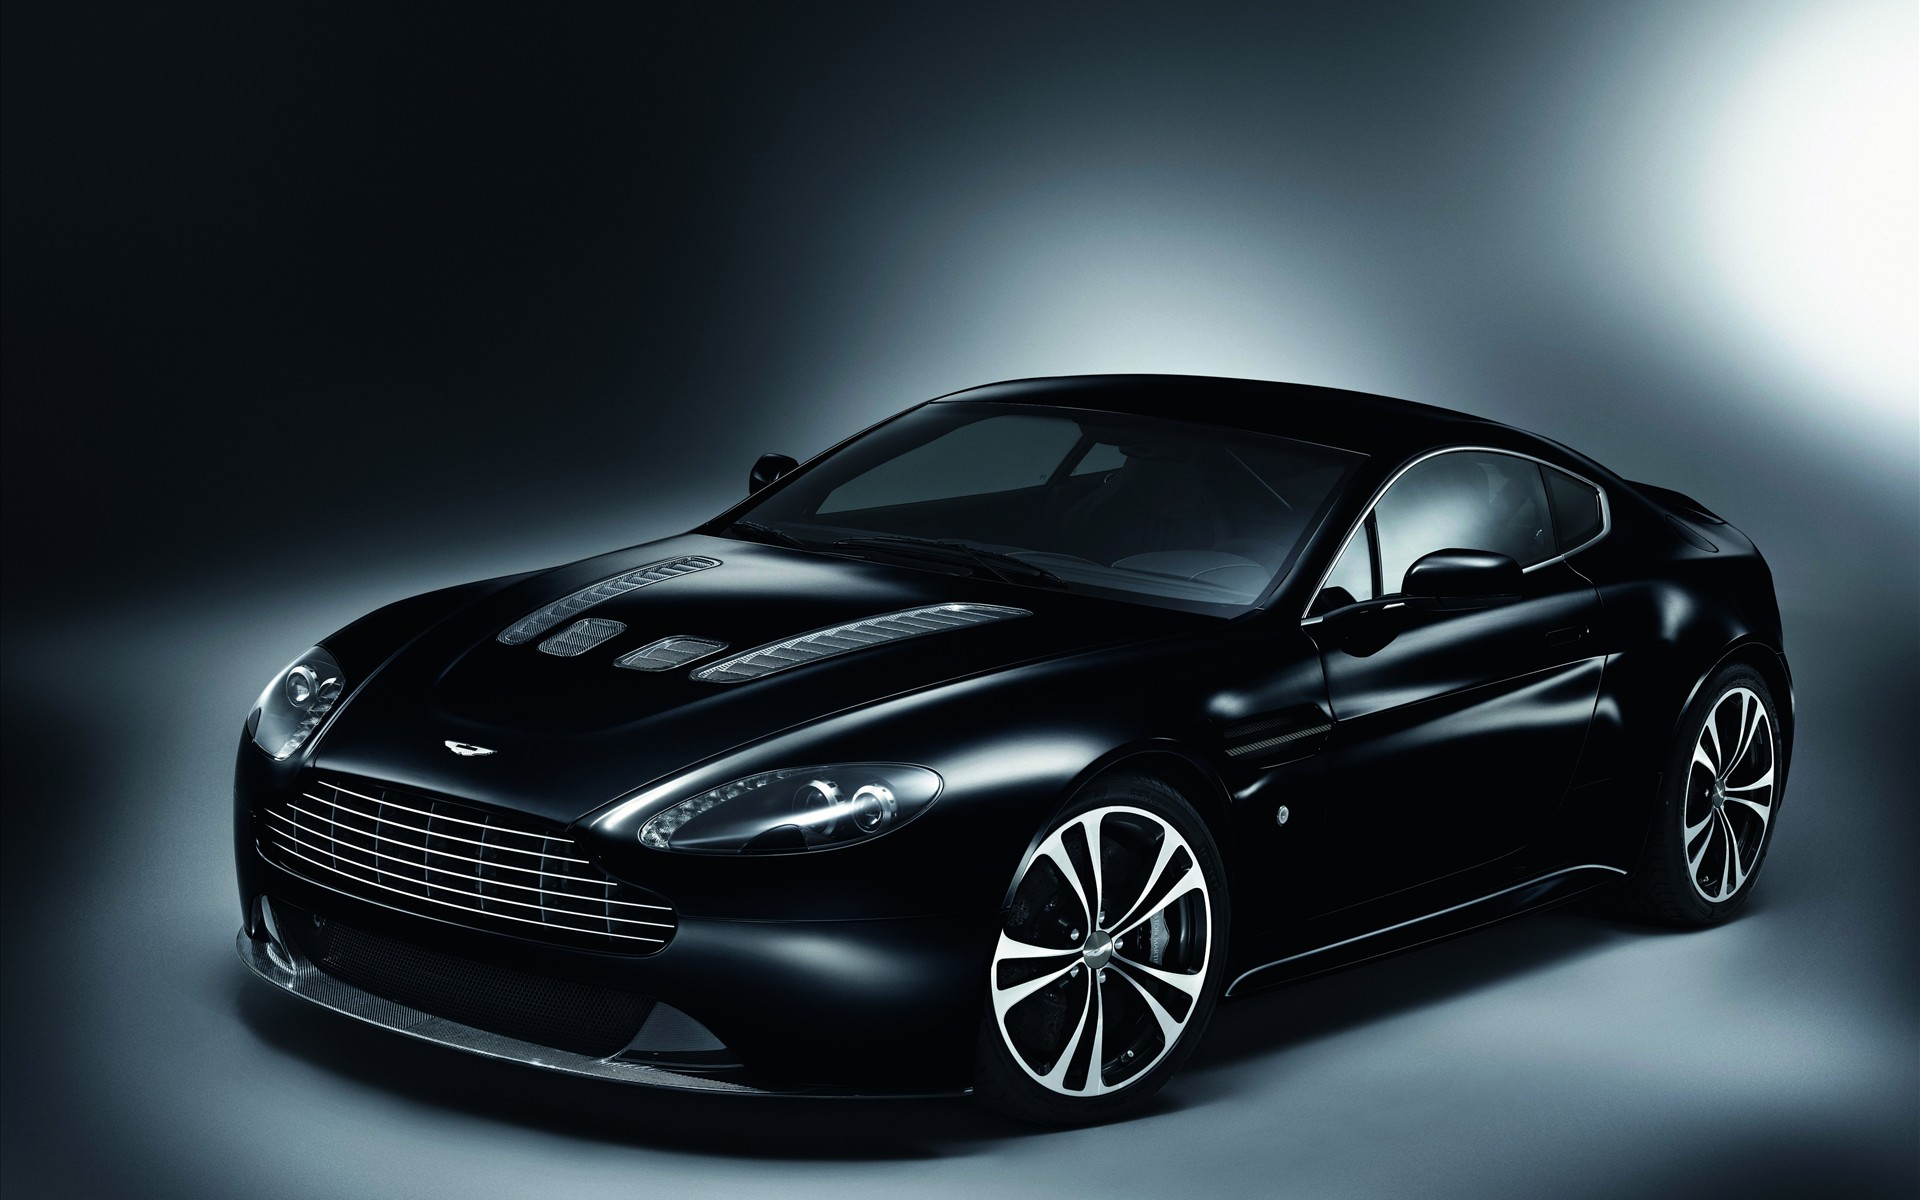 Aston Martin Wallpaper Hd 1920x1200